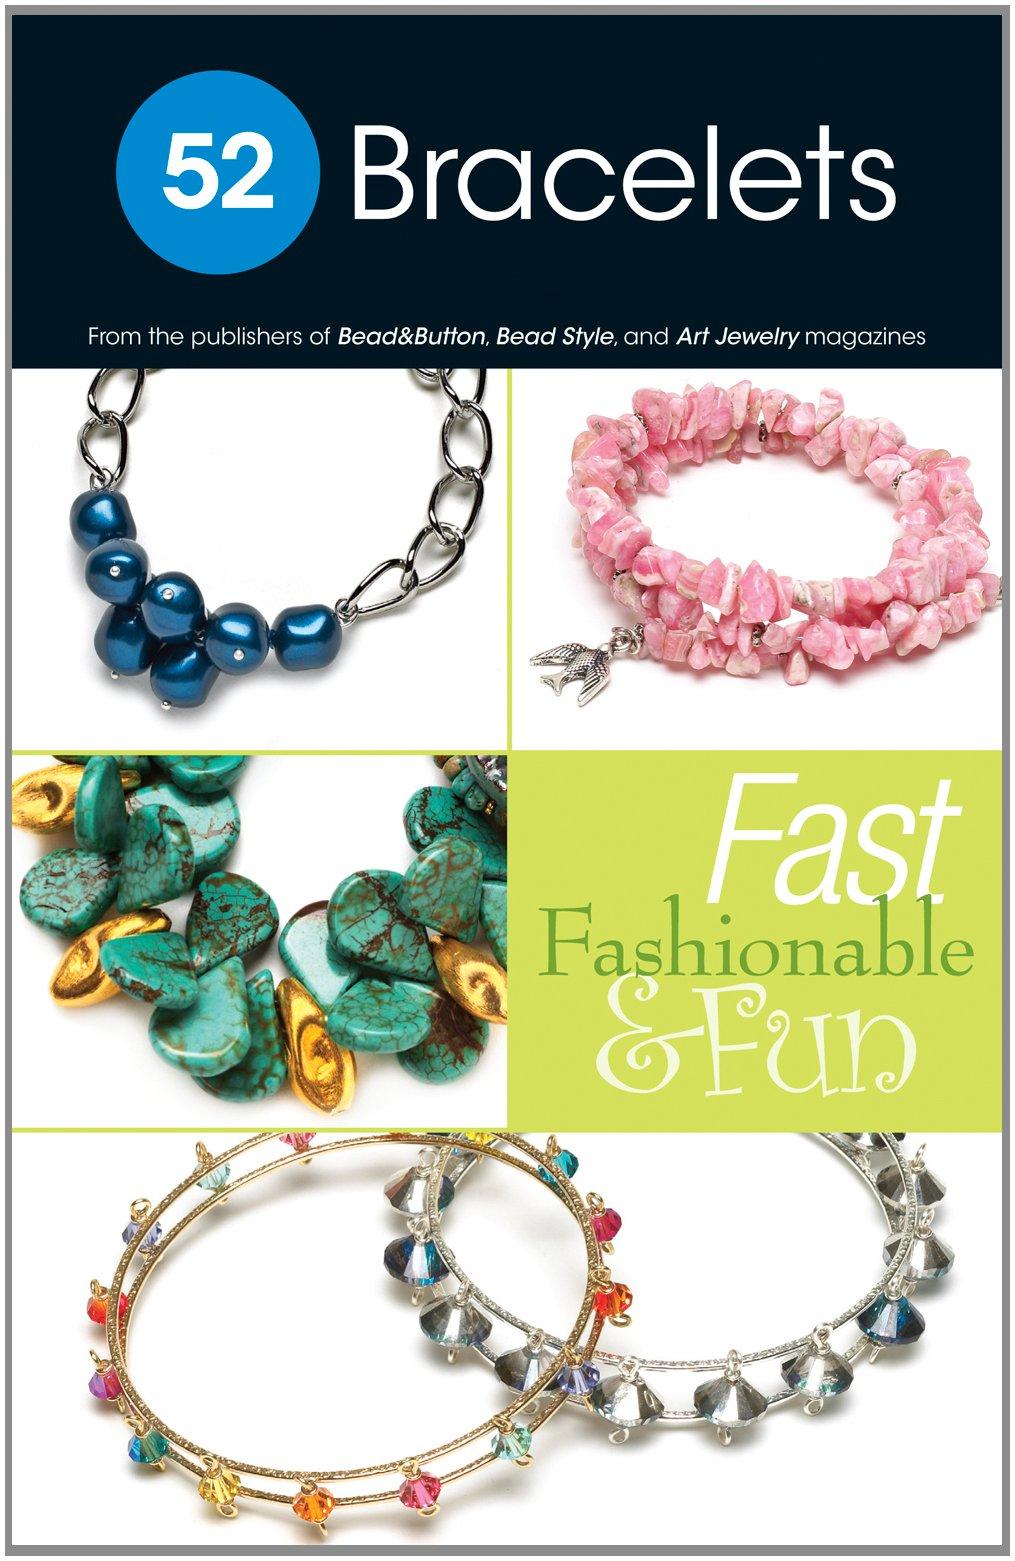 52 Bracelets: Fast, Fashionable & Fun: From Bead Style magazine ...